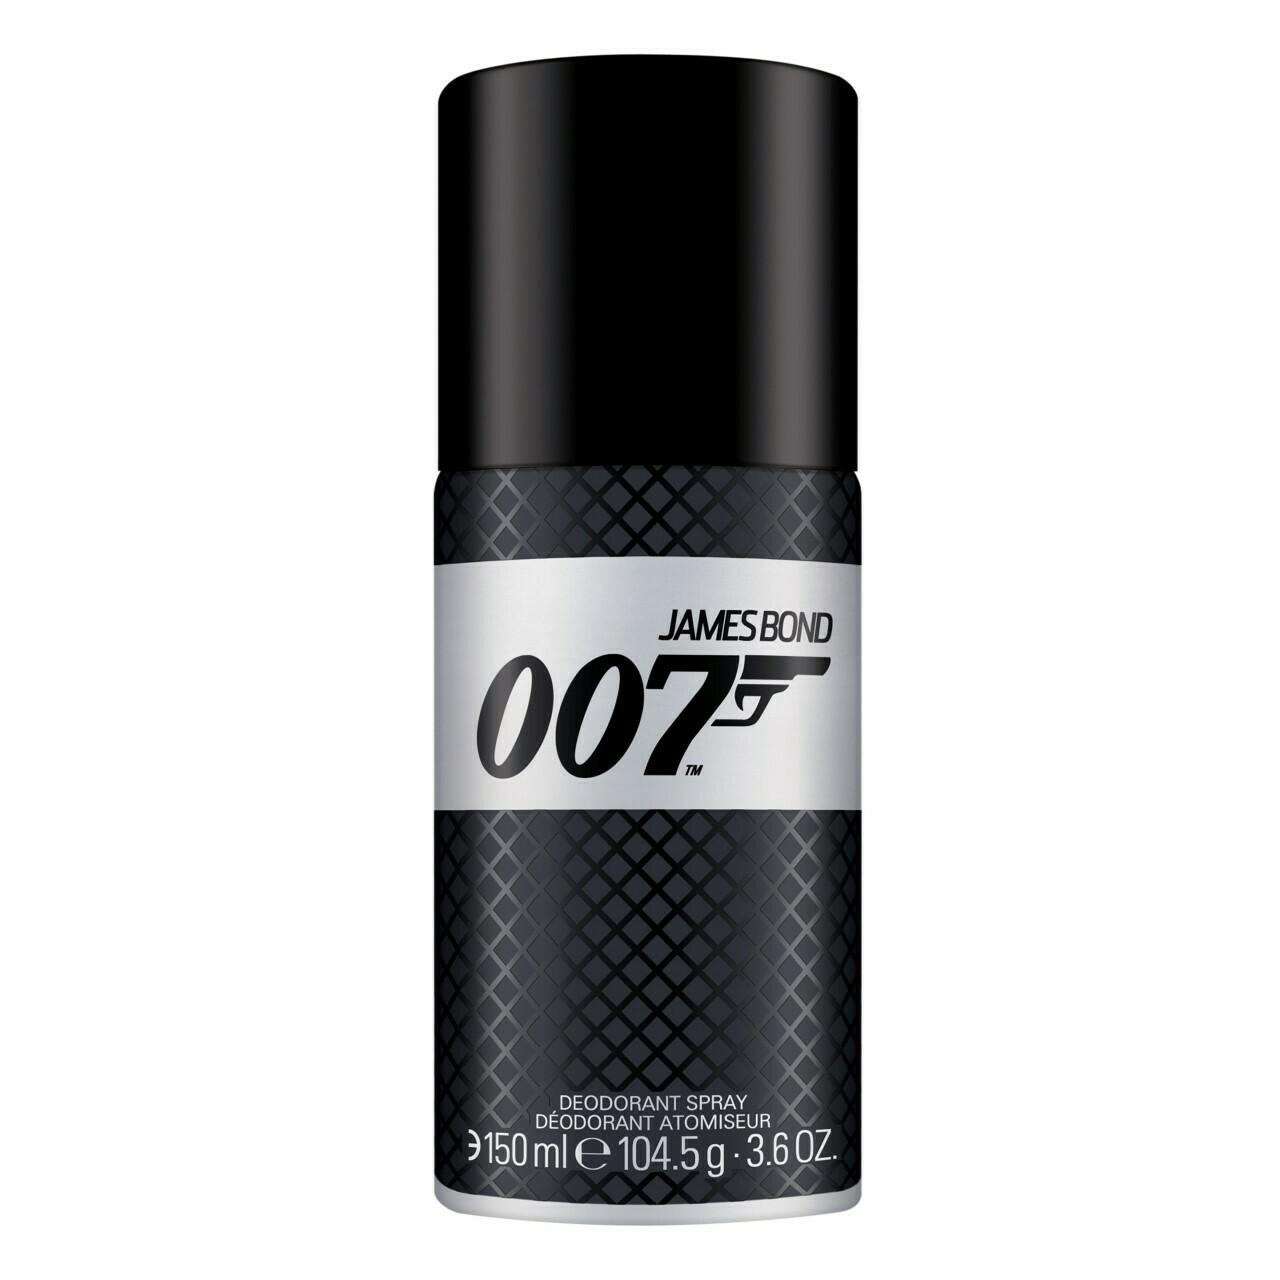 James Bond 007 Deodorant for him 150ml